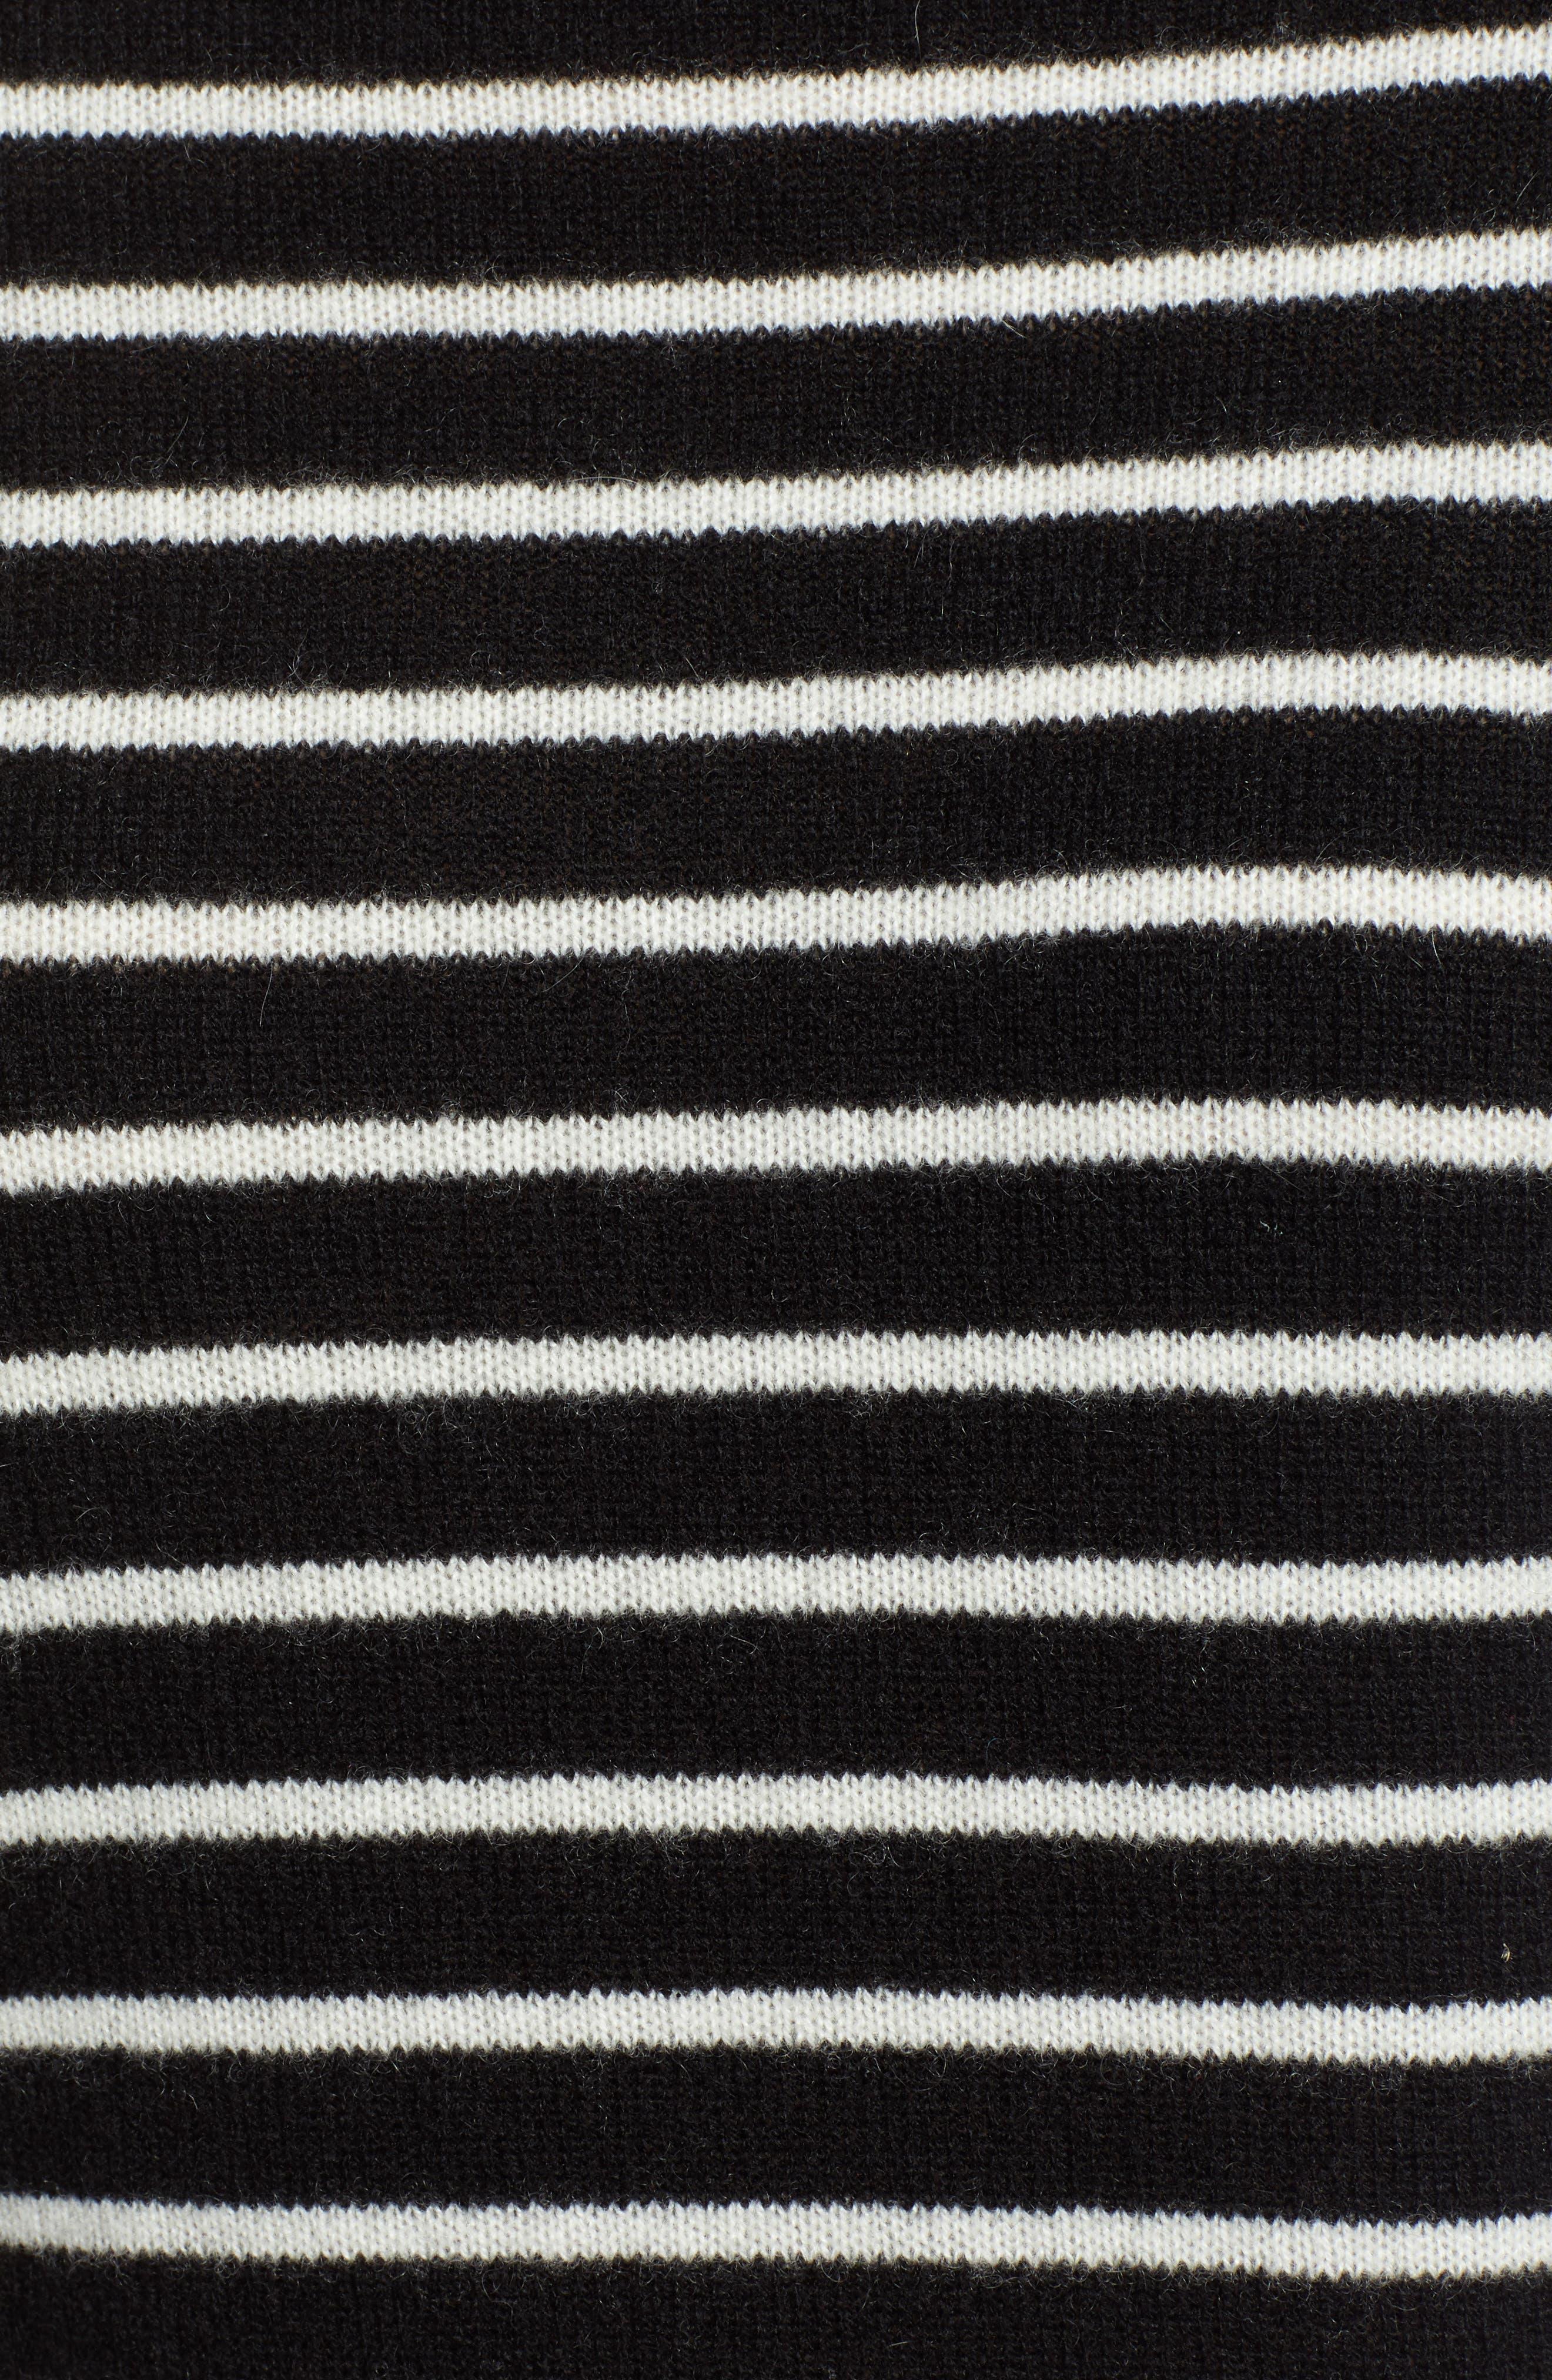 Cashmere Turtleneck Sweater,                             Alternate thumbnail 5, color,                             BLACK- IVORY STRIPE